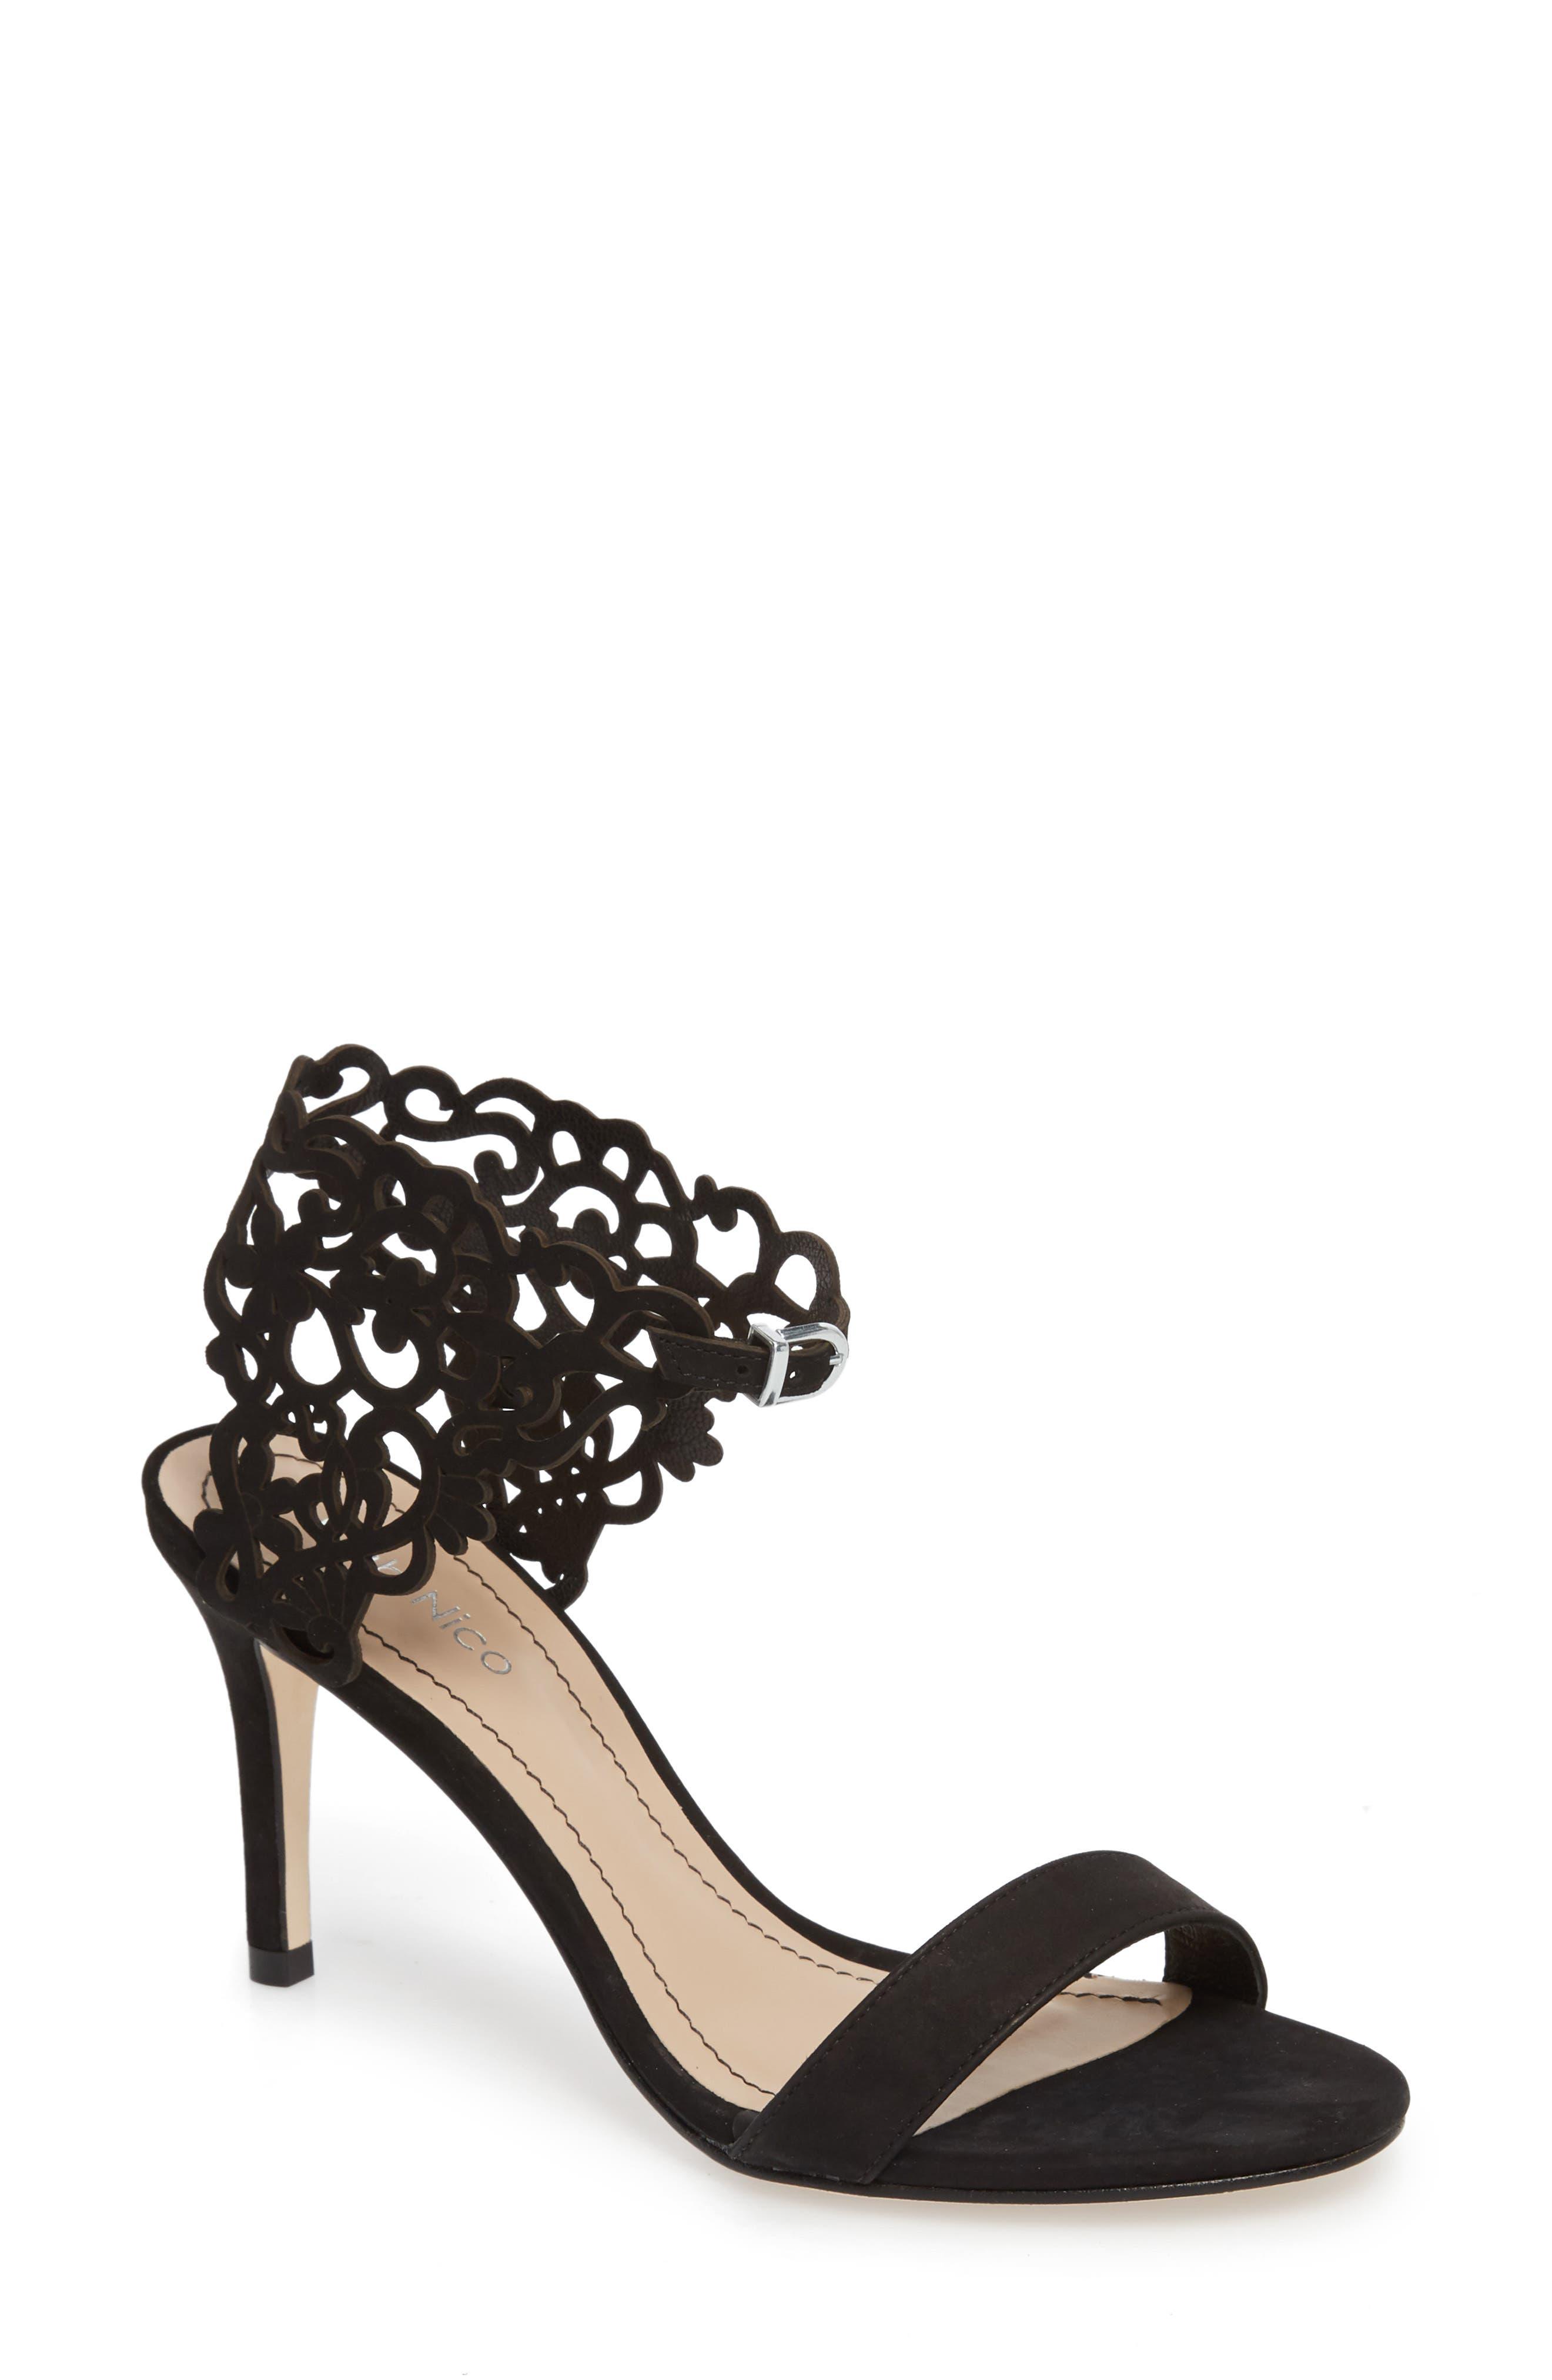 Klub Nico Adira Laser Cut Sandal, Black